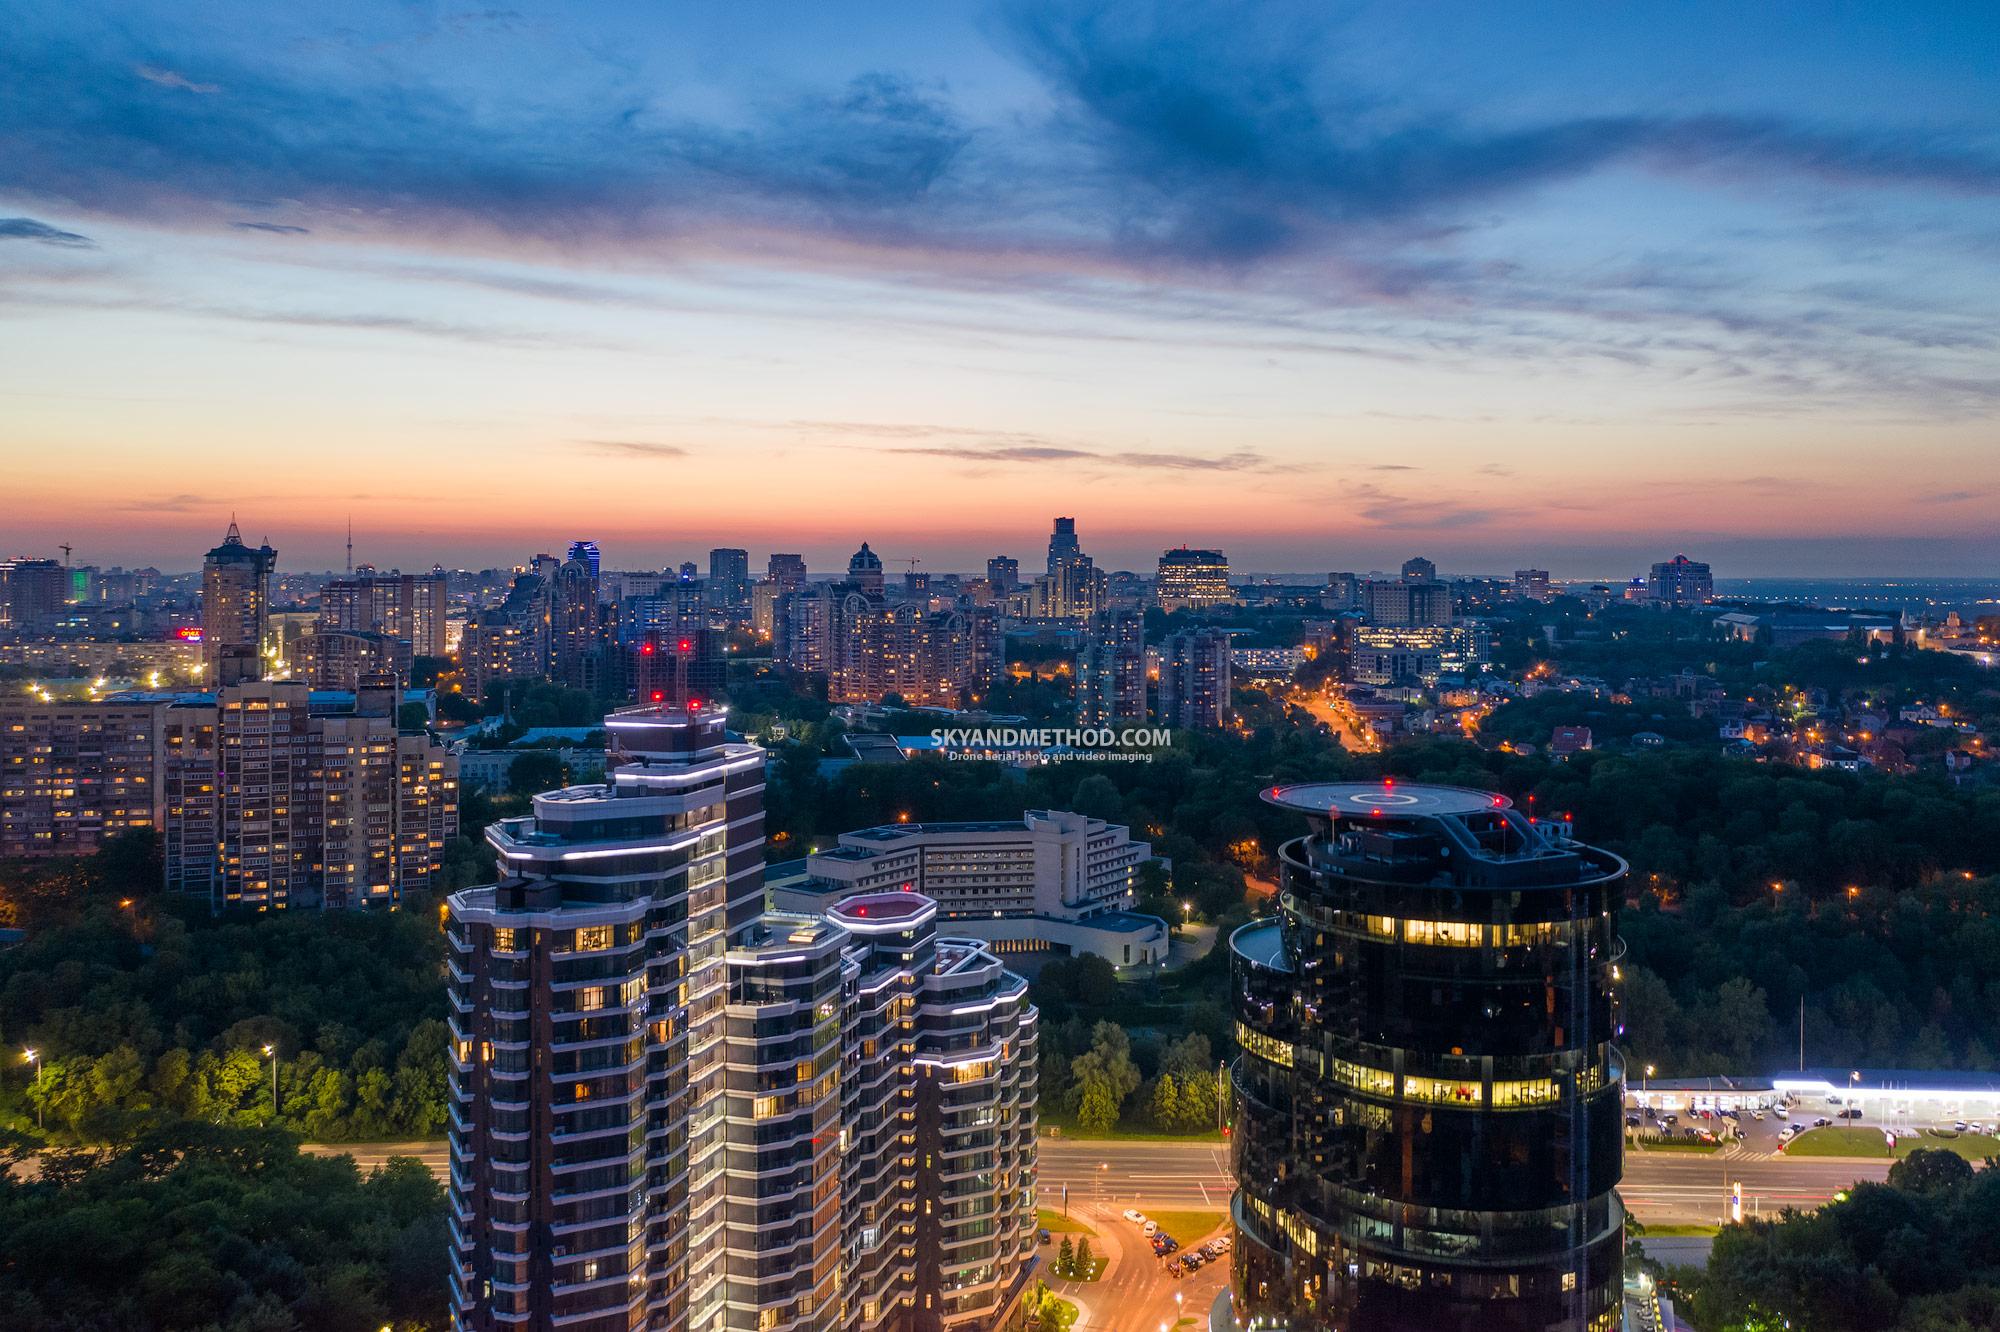 Аэросъёмка вечернего Киева. IQ Business center & PecherSky apartments